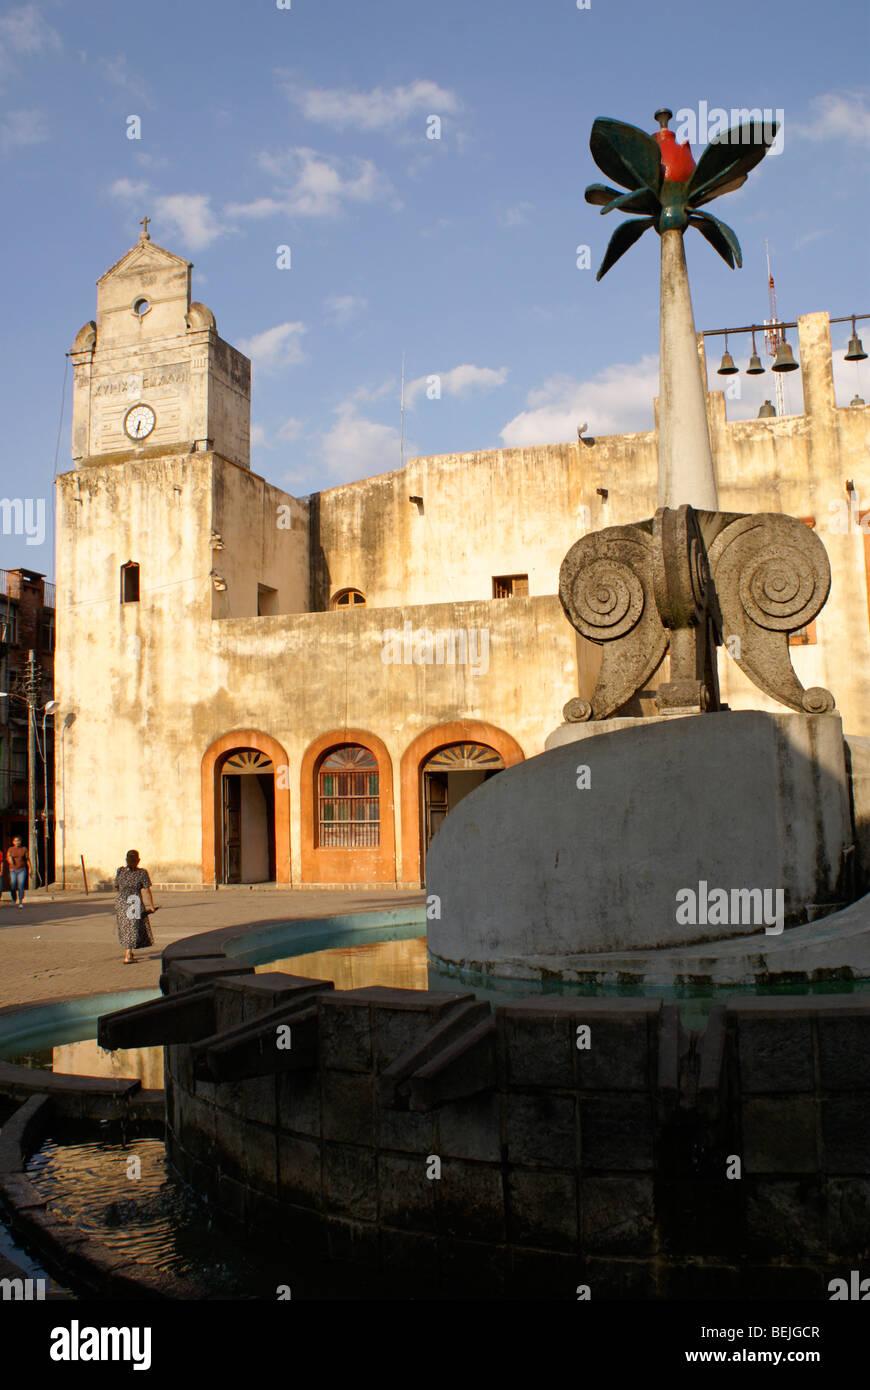 The Convento de San Agustin on the main square in Xilitla, San Luis Potosi state, Mexico - Stock Image